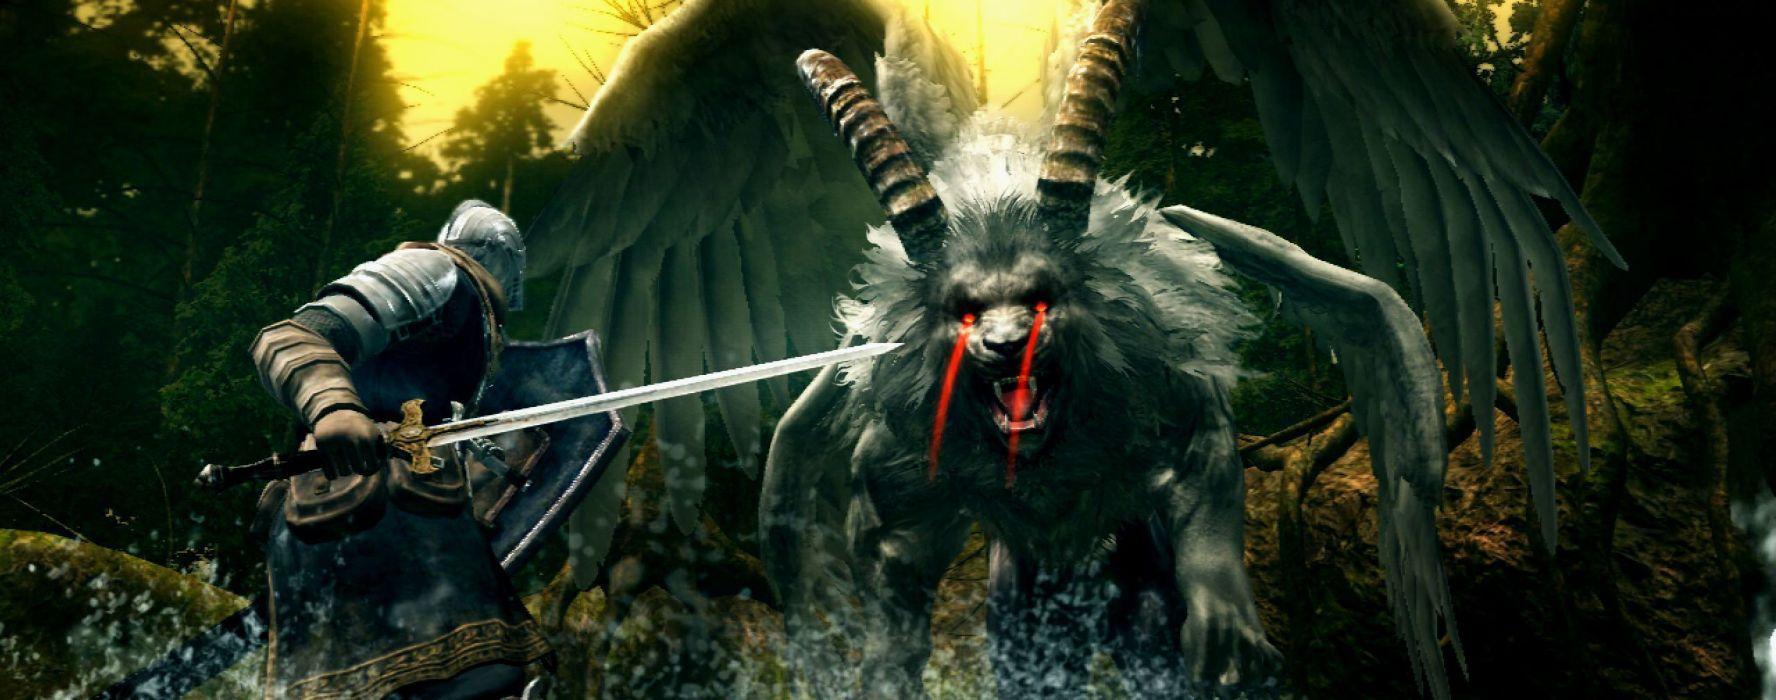 Dark Souls Prepare to Die fantasy warrior (6) wallpaper